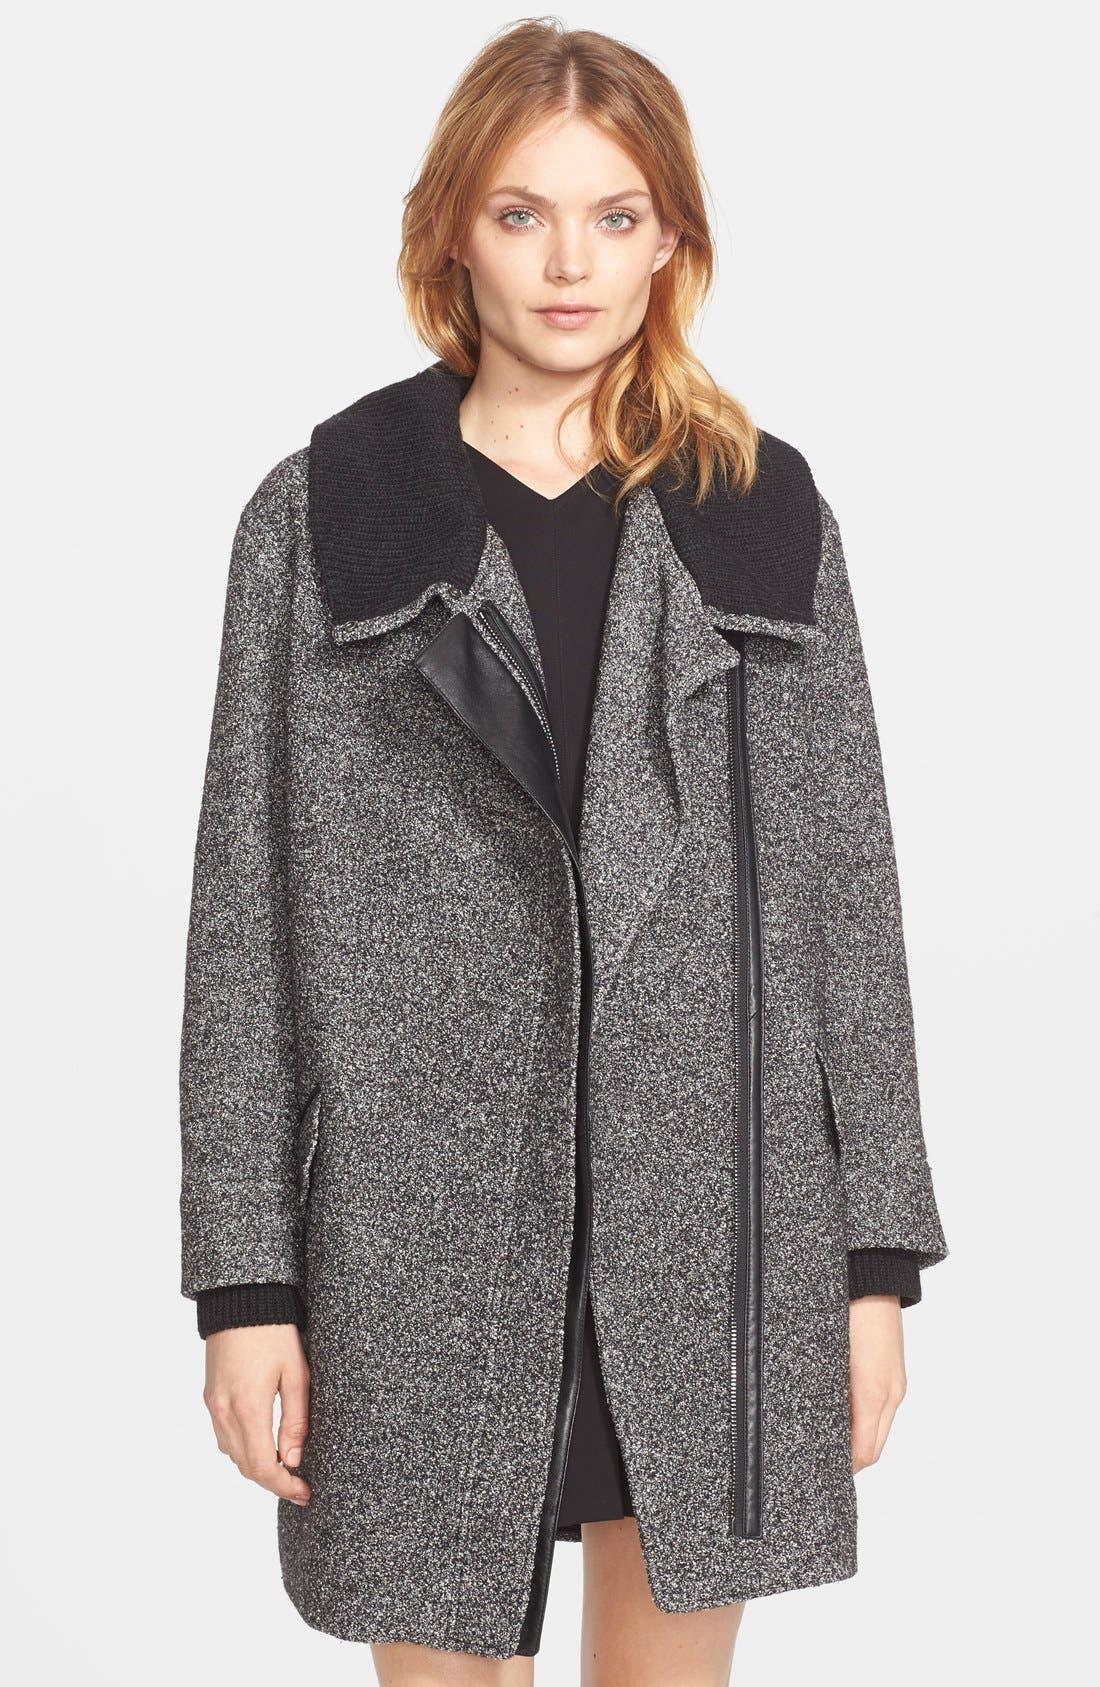 Rib Knit Collar Asymmetrical Coat,                             Main thumbnail 1, color,                             Black/ Off White